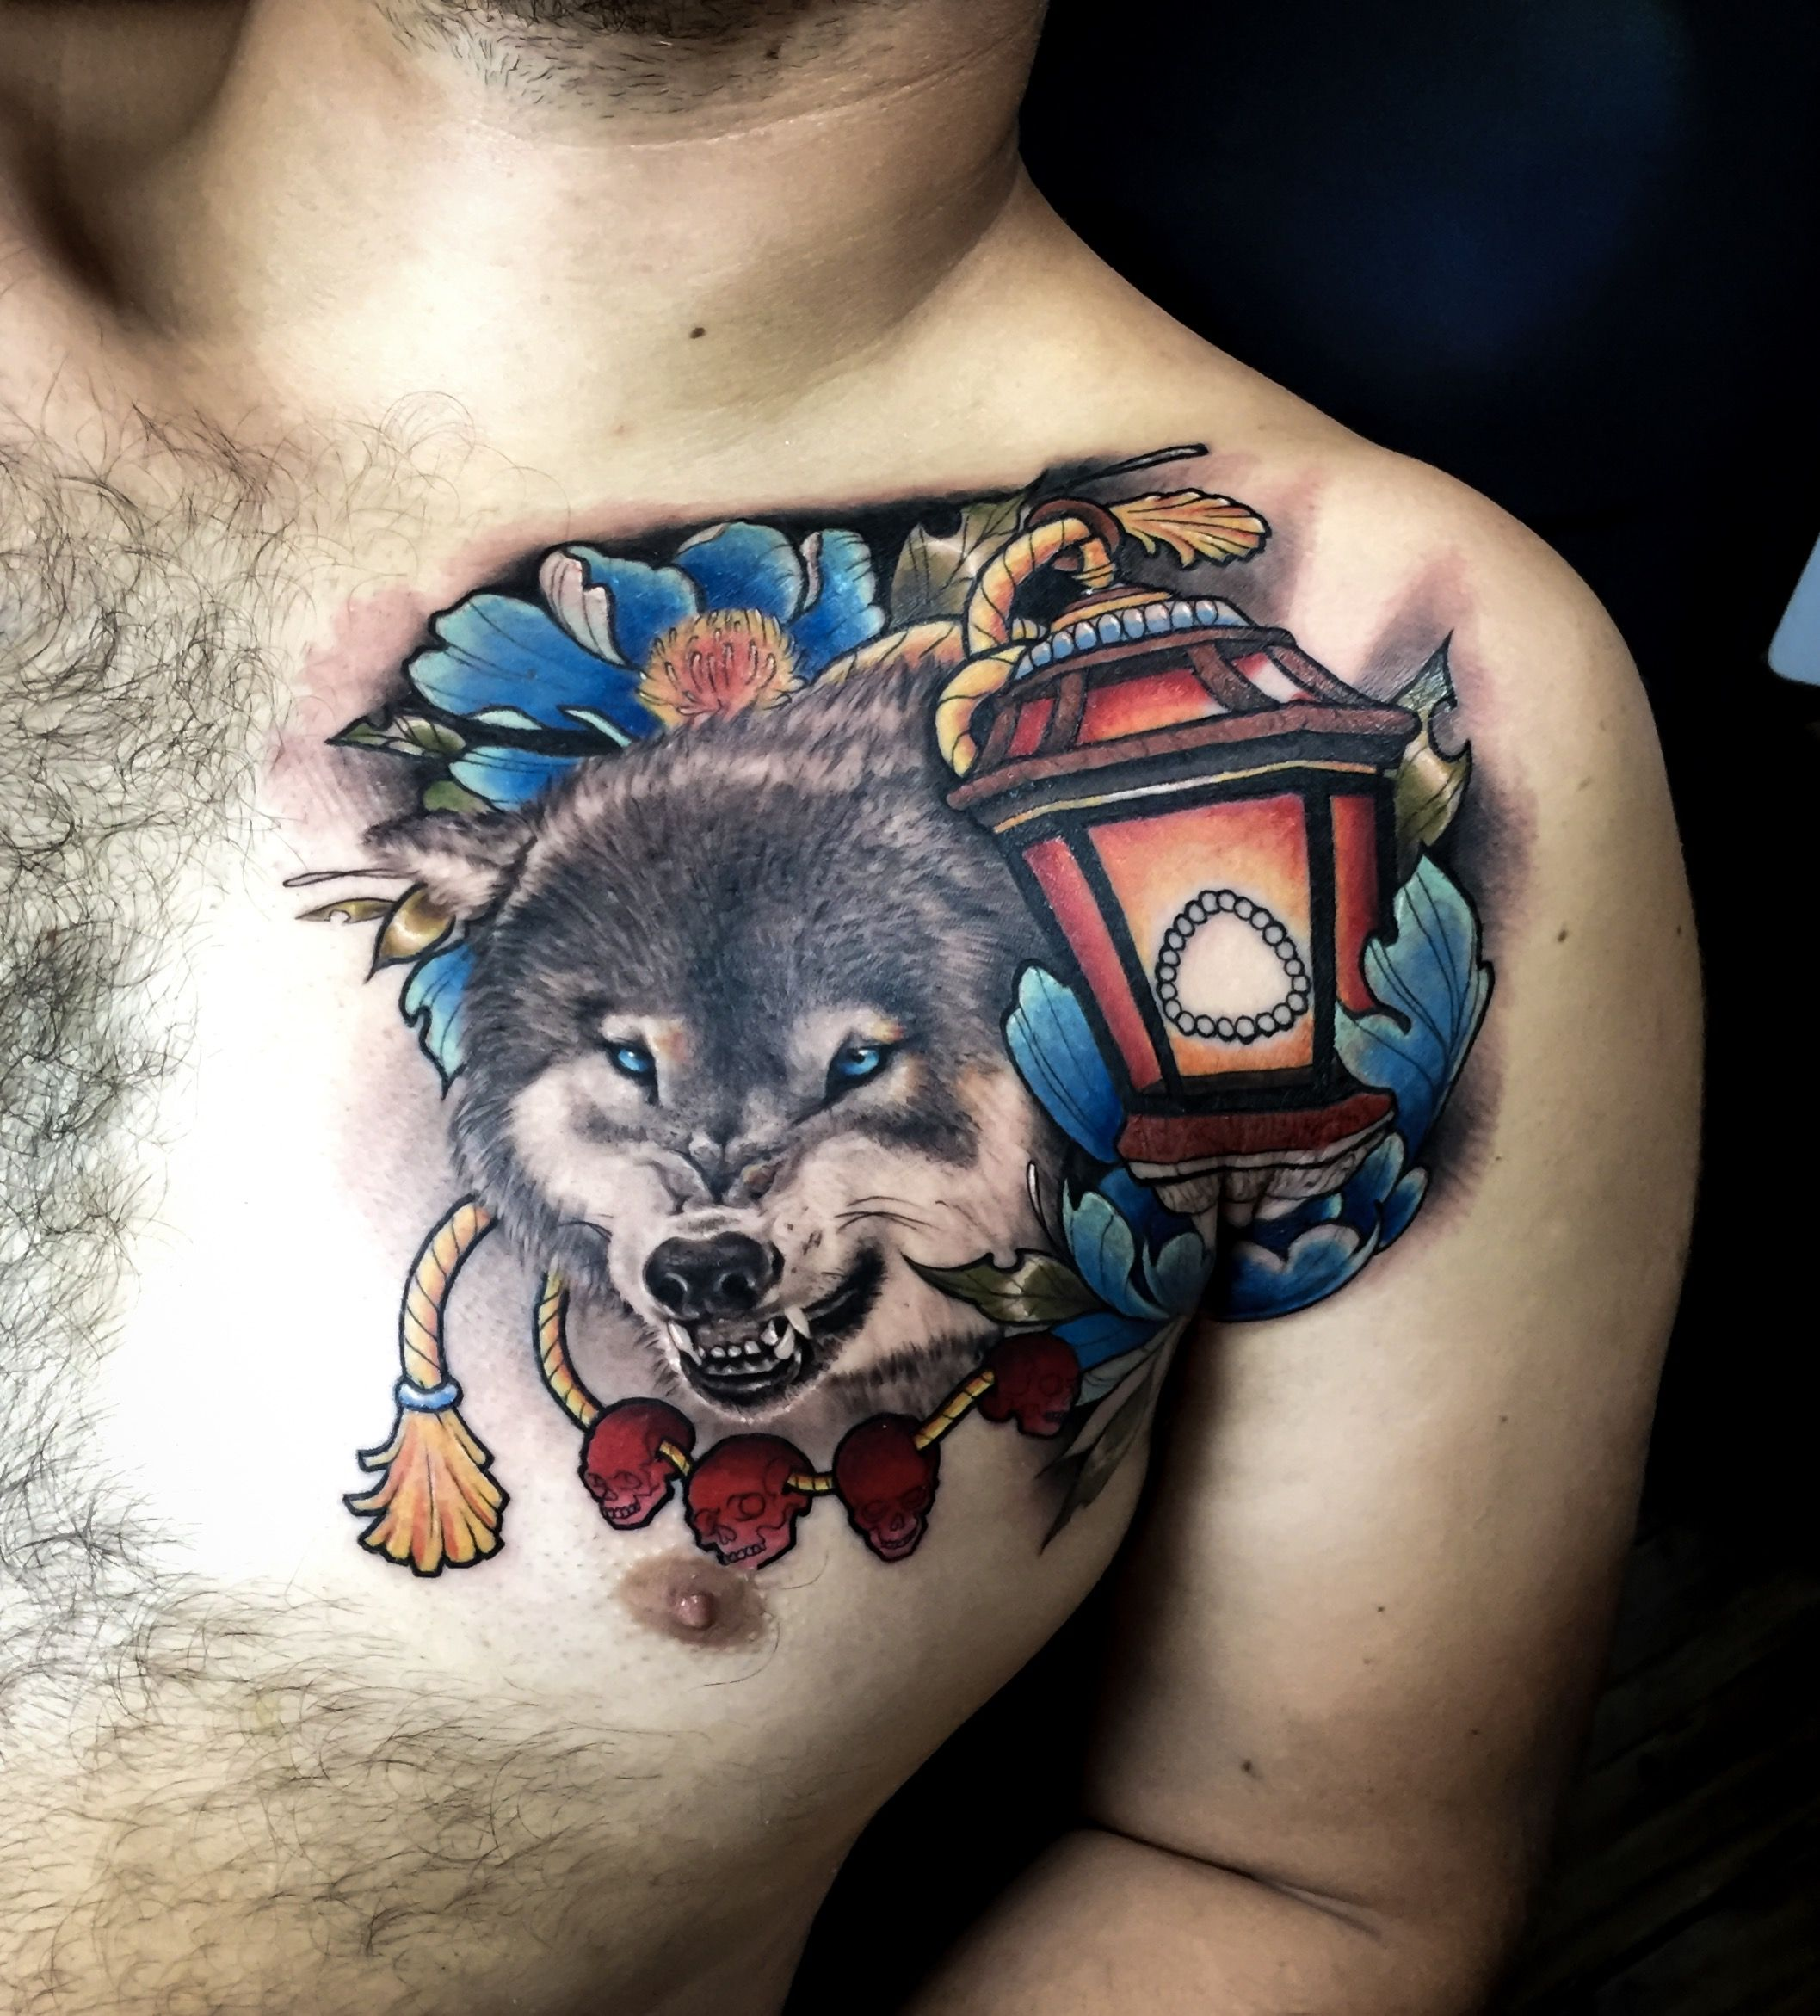 @lovetattooec @inkmens #guayaquiltattoo #tattoowork #tattooguayaquil #tattooecuador #arte #tattooart #sombras #realistictattoo #tattoostyle #lovetattoo #guayaquil #anclatattoo #realismotattoo #tatouage #blackandgreytattoo #art #inkedup #tattoo #tattoos #ink #inked #tatuaje #inktober #realistictattoo #tatuagem #tatuaggios #realistic #realism #retrato #neotraditional